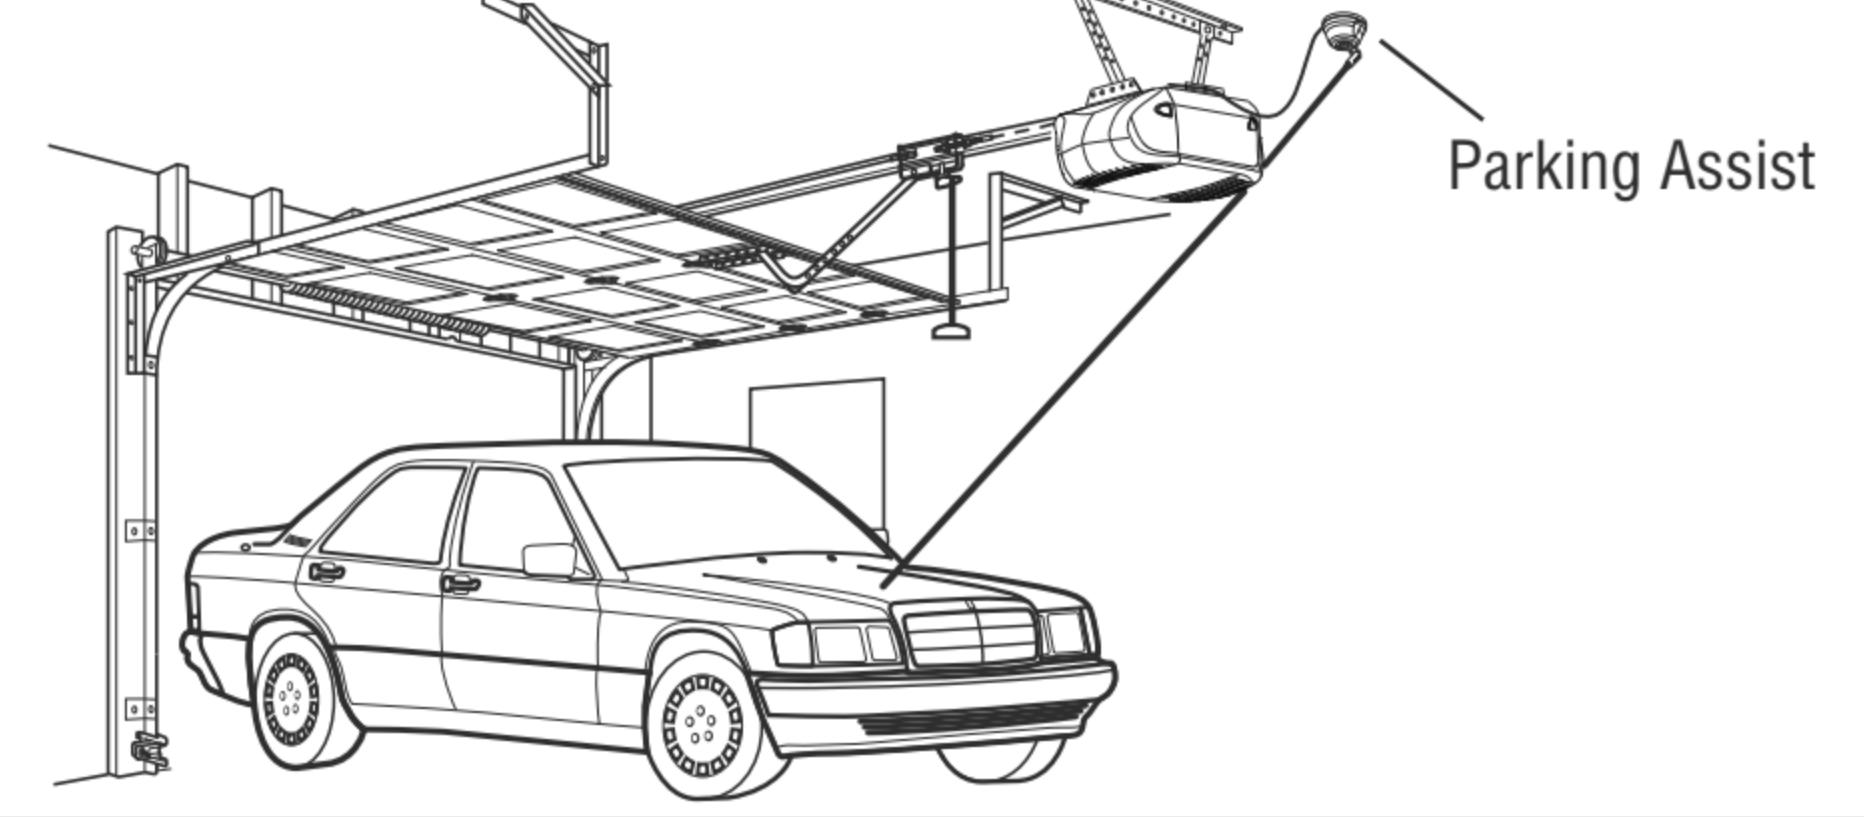 Chamberlain Garage Laser Parking Assist Mercedes Benz Ml Engine Diagram Park